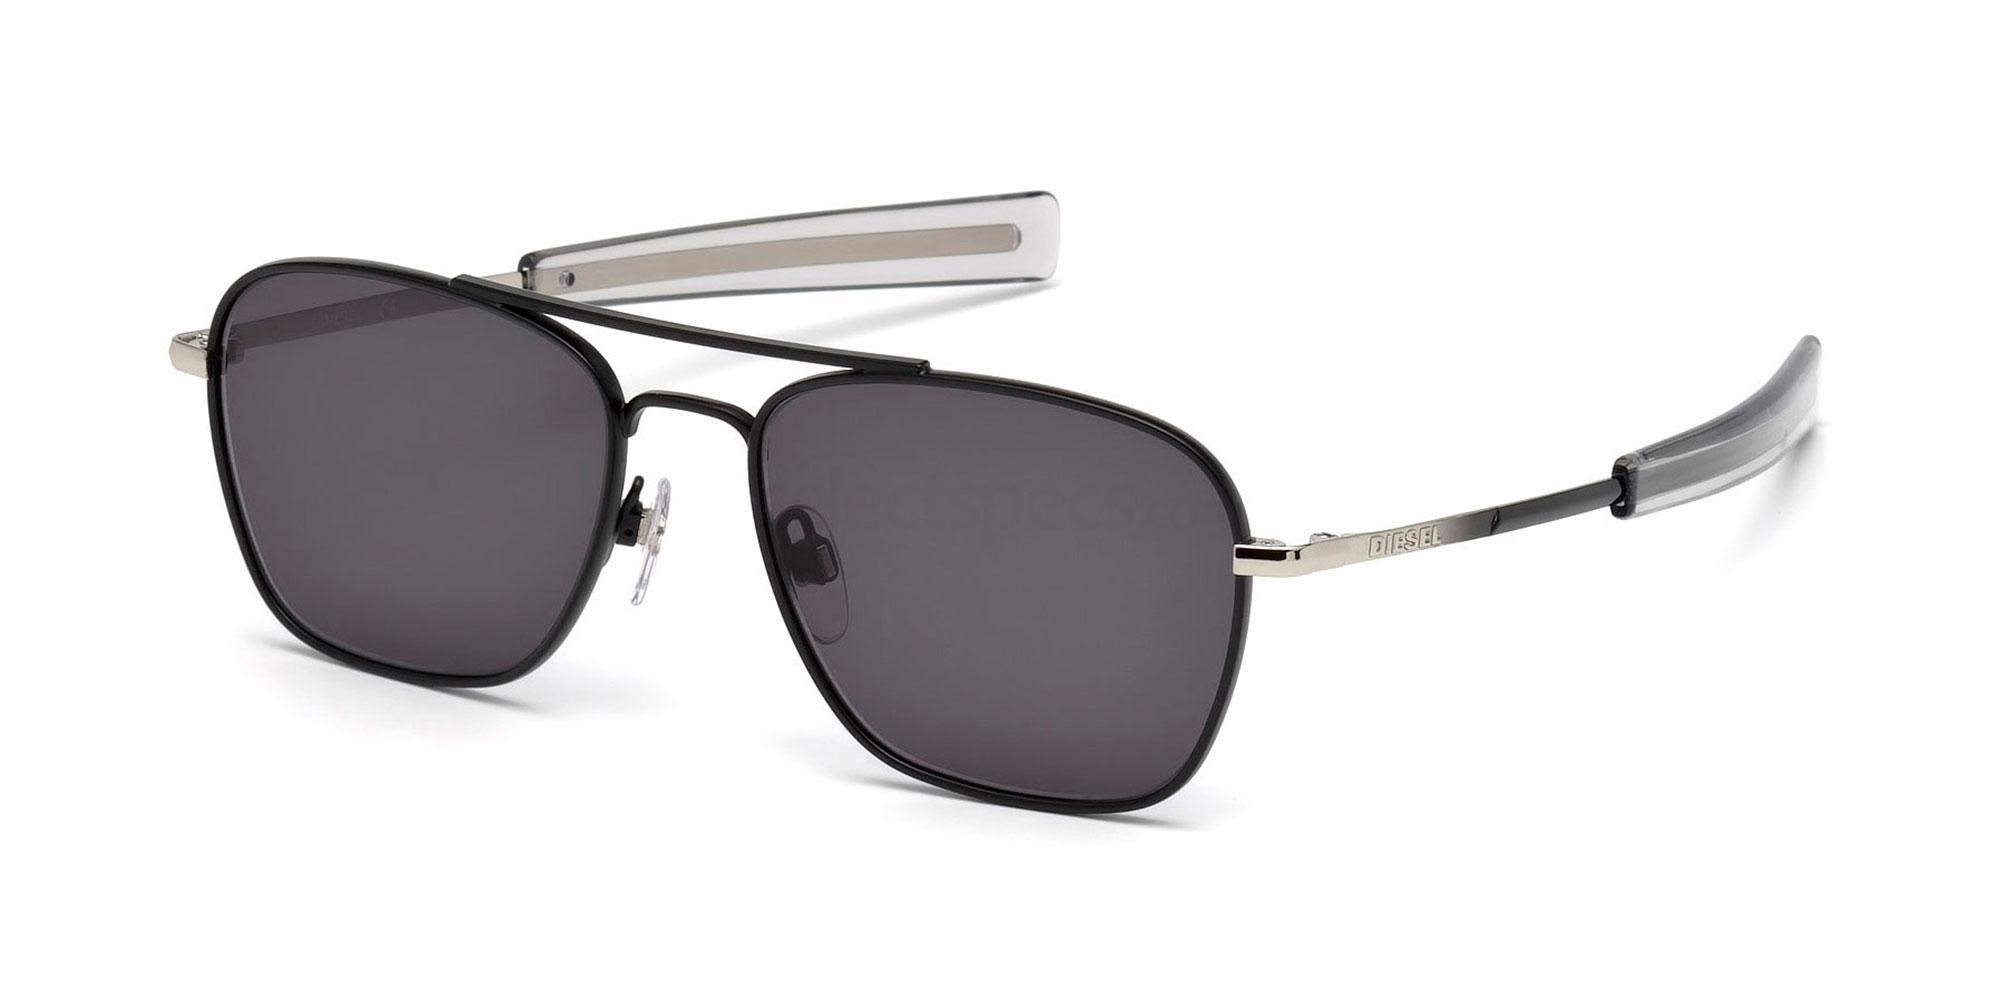 05A DL0219 Sunglasses, Diesel